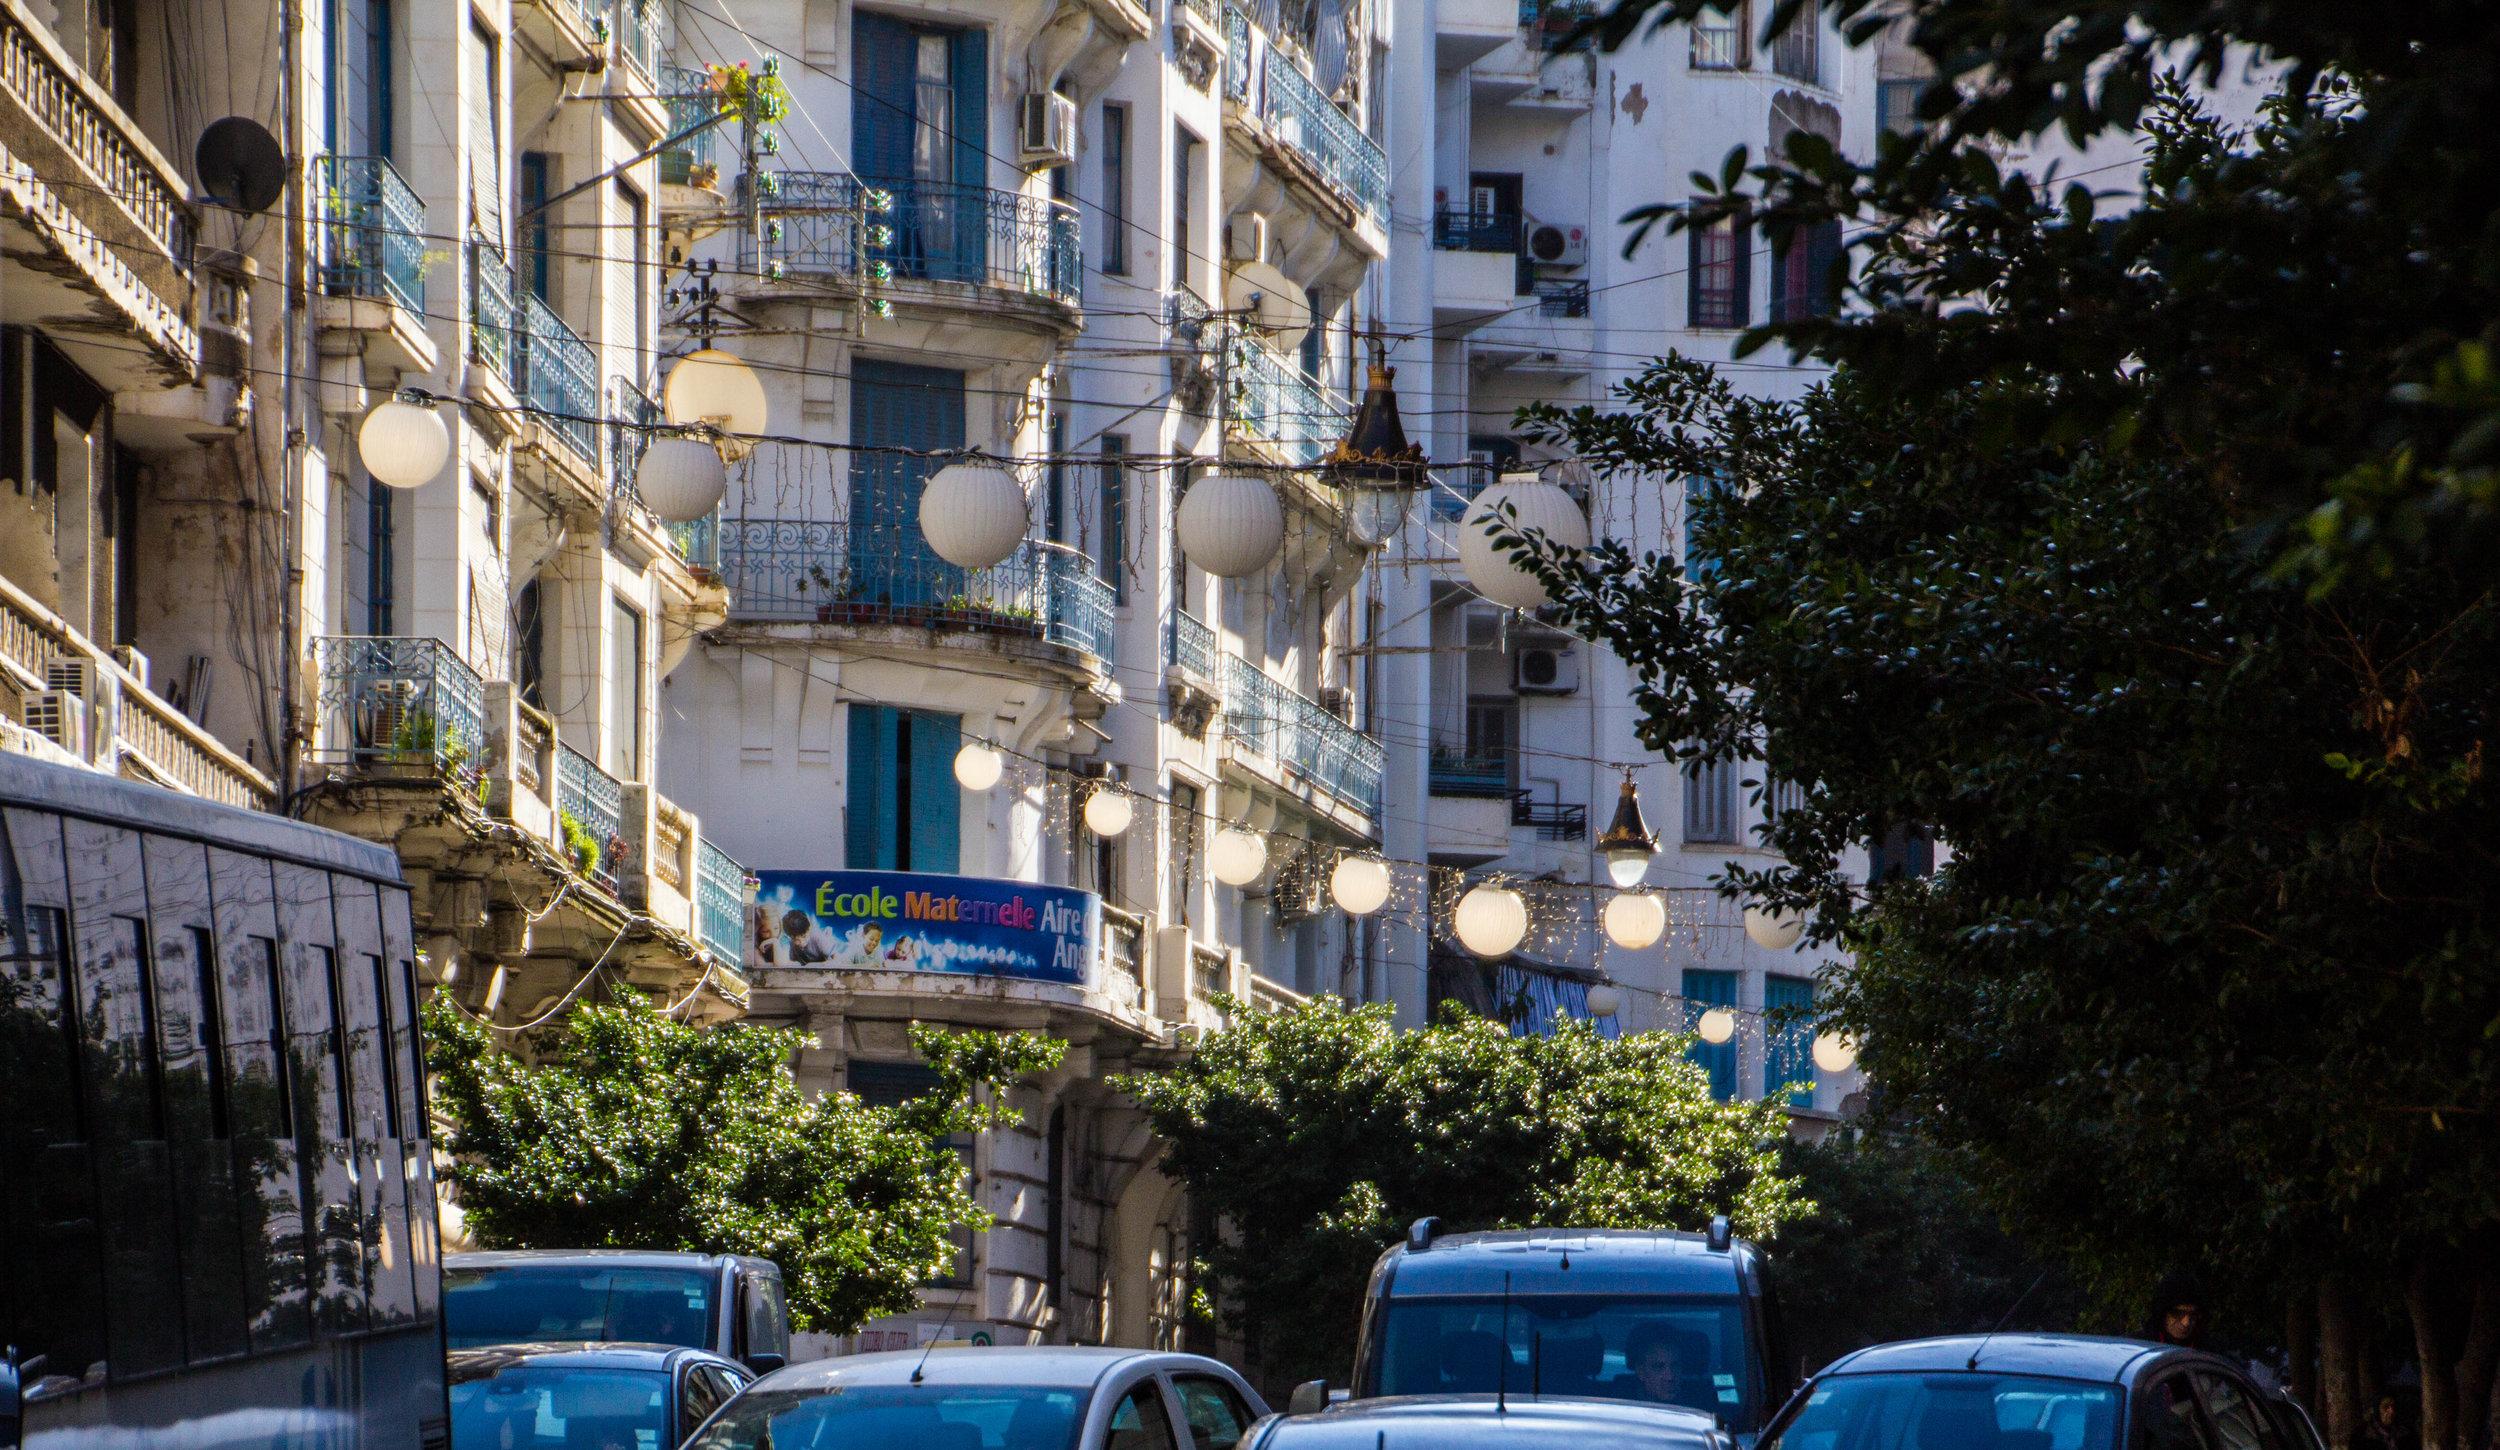 streets-algiers-algeria-23.jpg